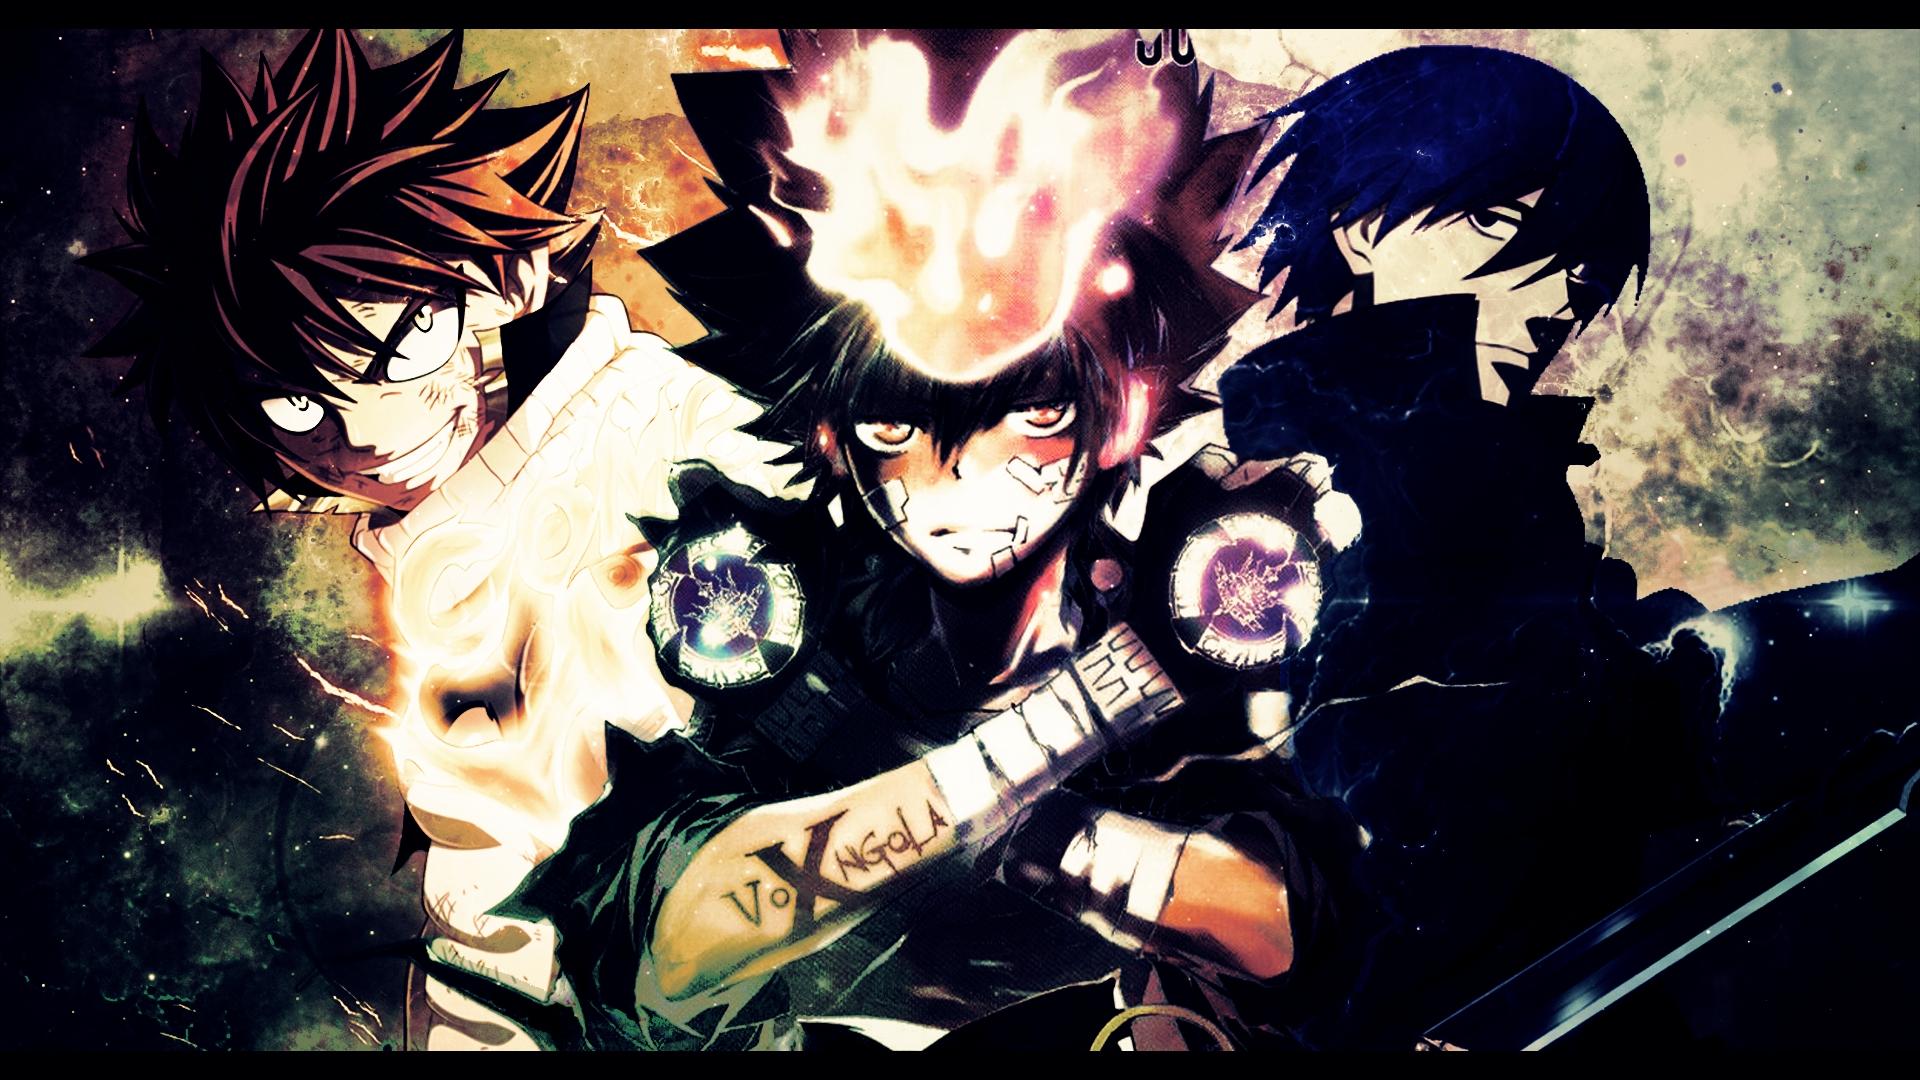 Anime Hd Wallpapers